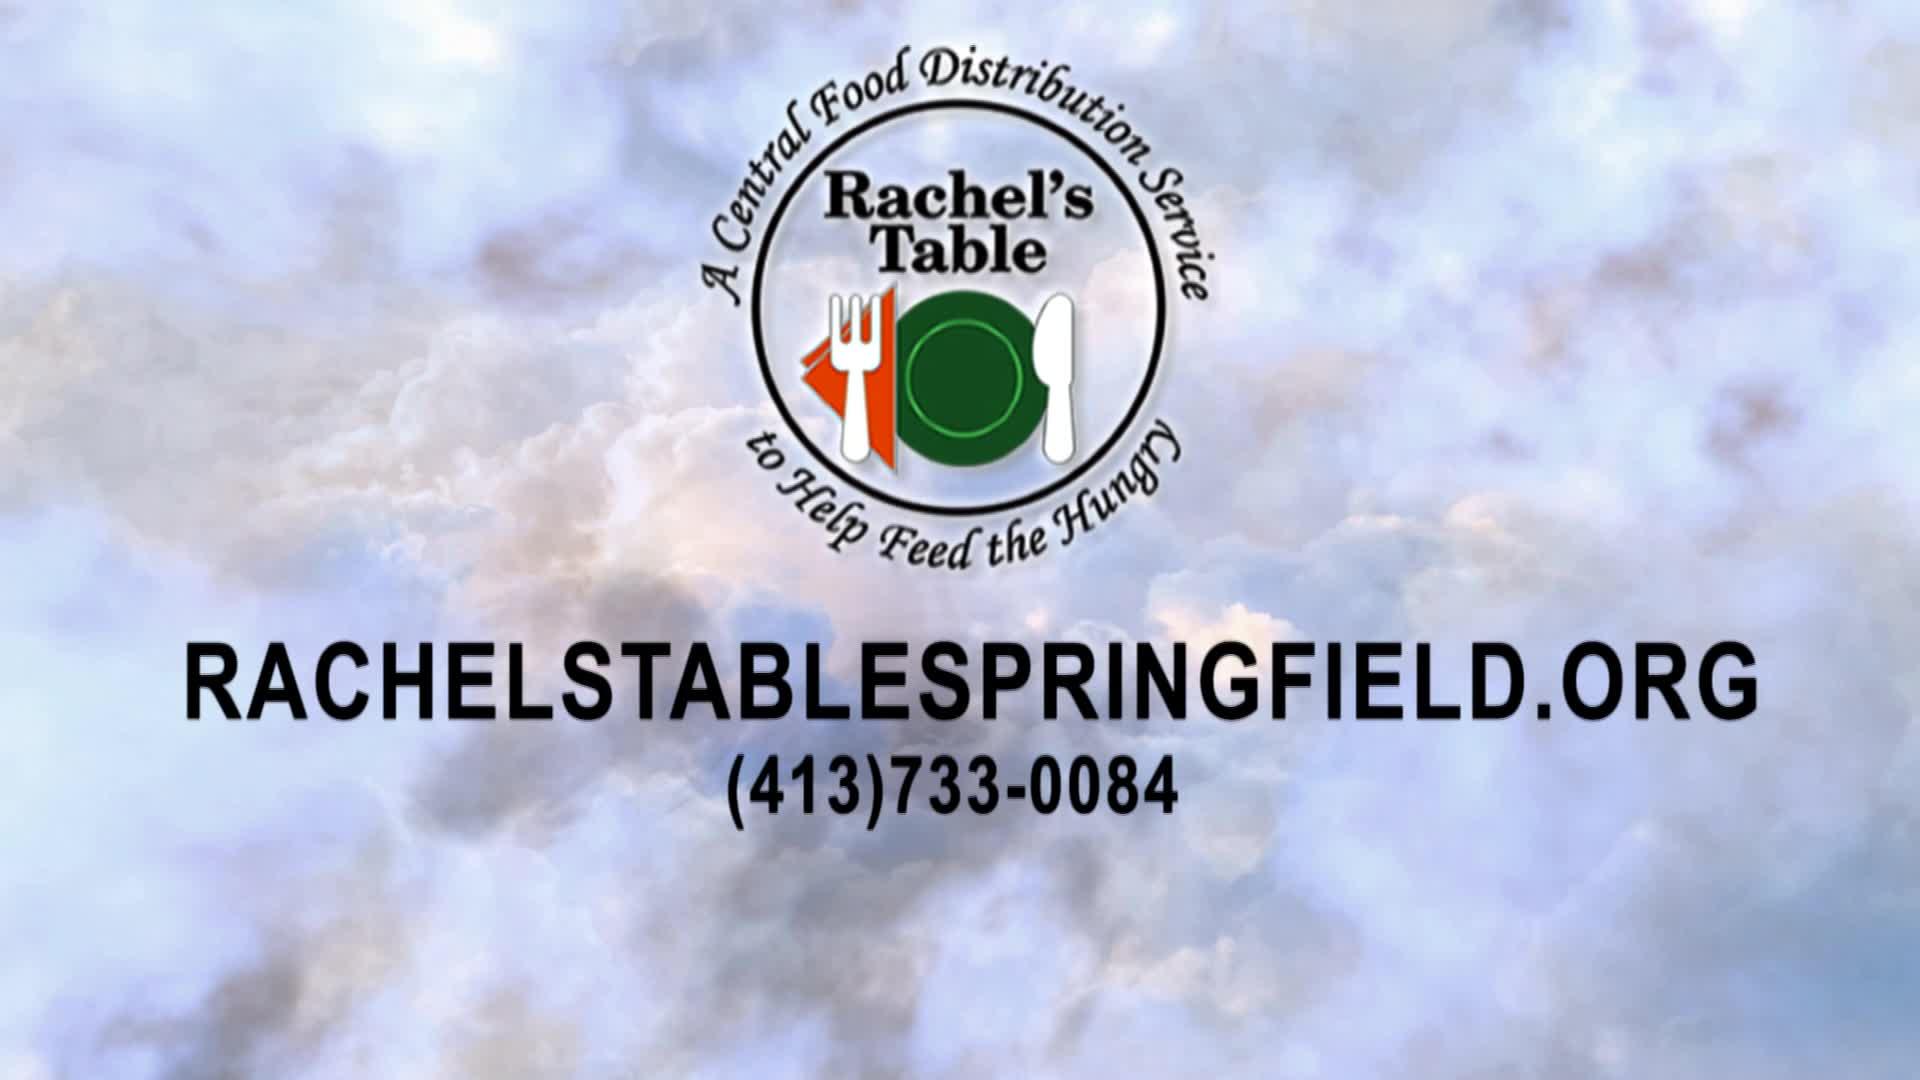 Rachel's Table